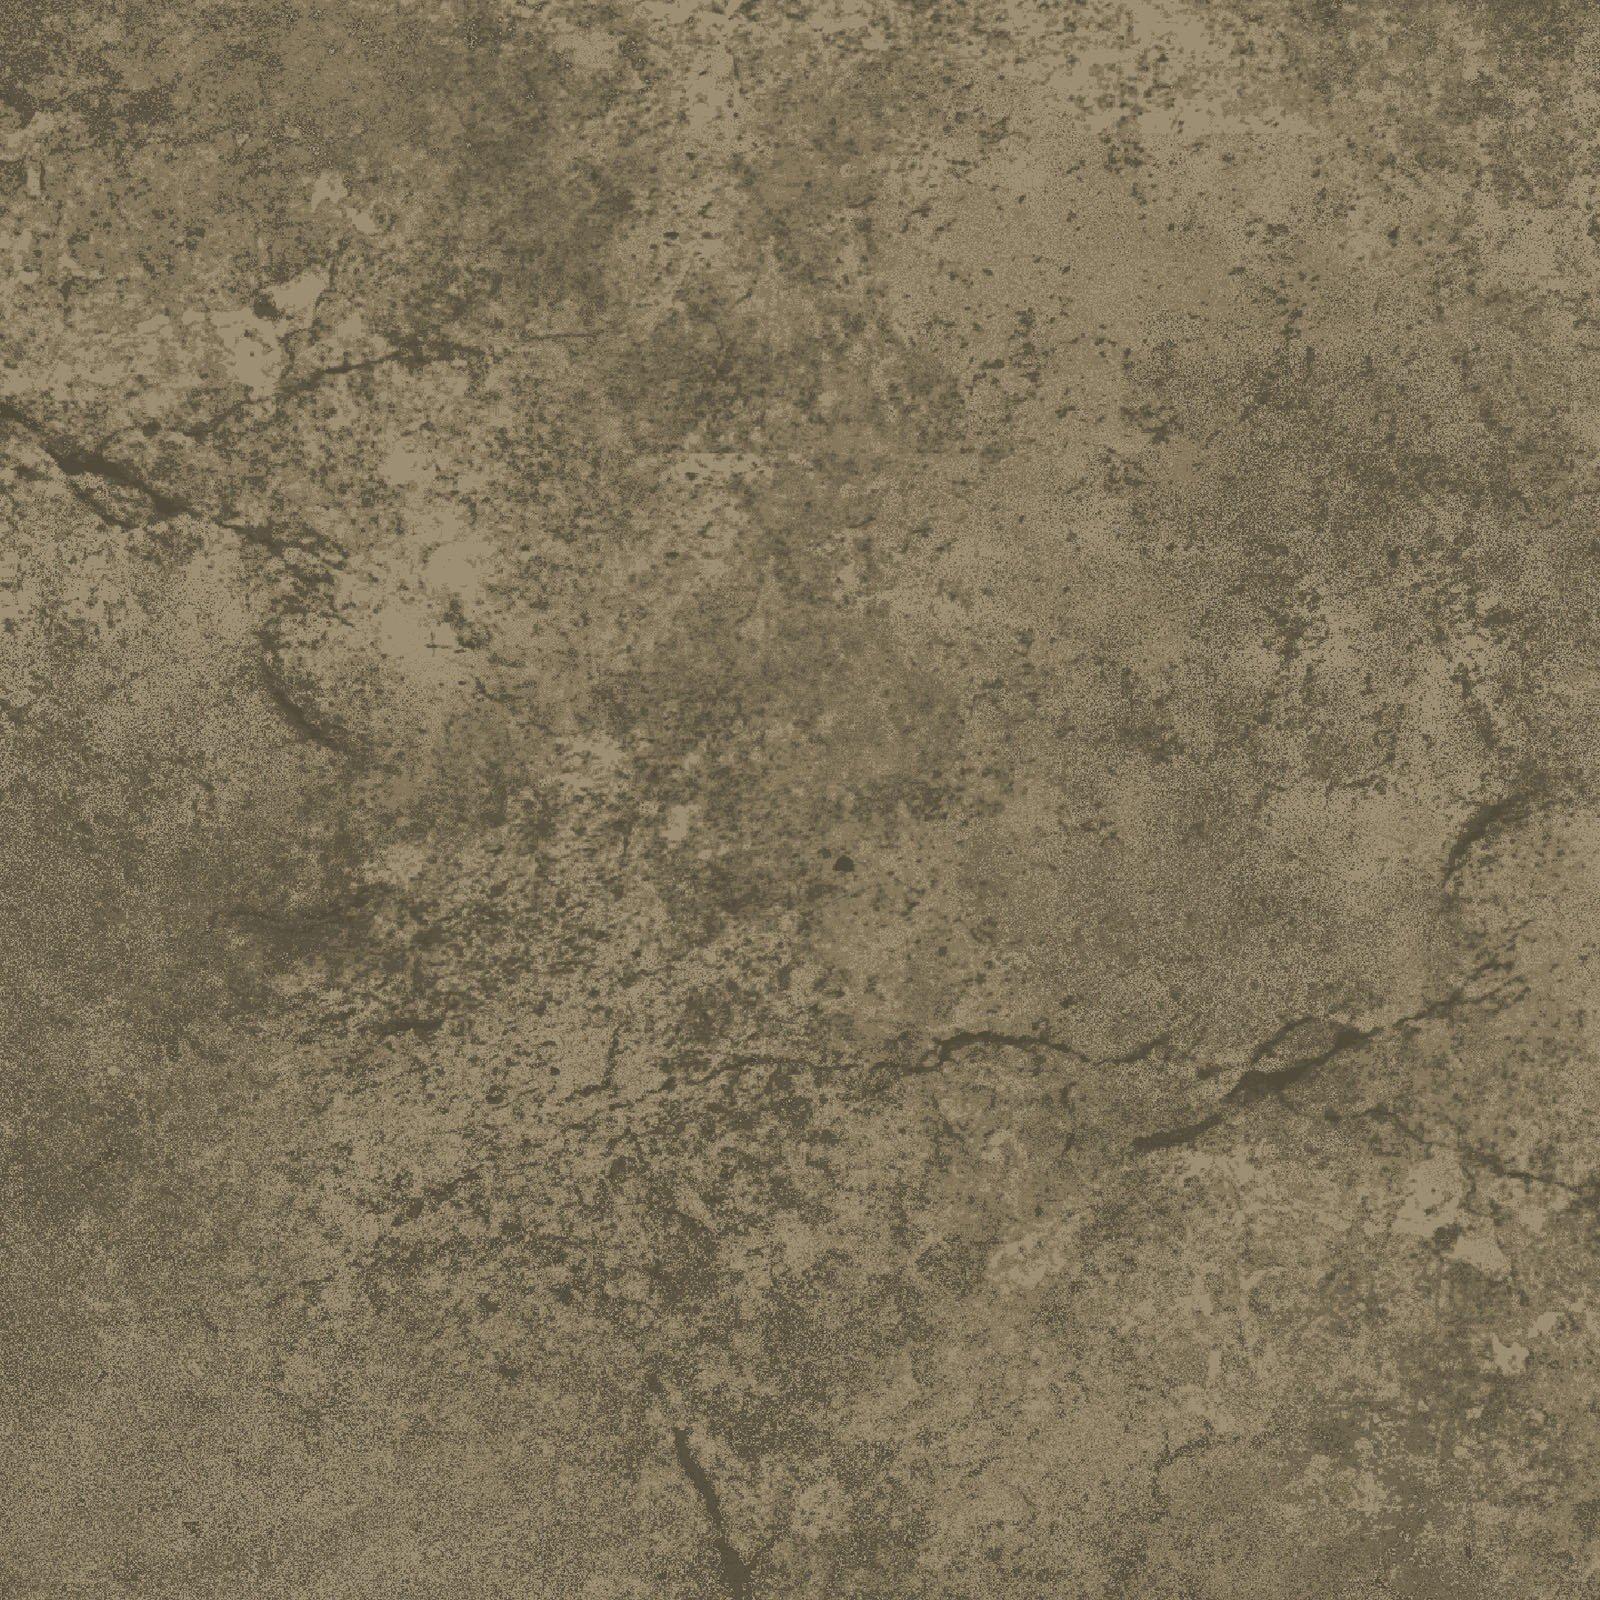 High Country Crossing - Granite - Taupe - Maywood Studio - 714329930183 - 1533254504